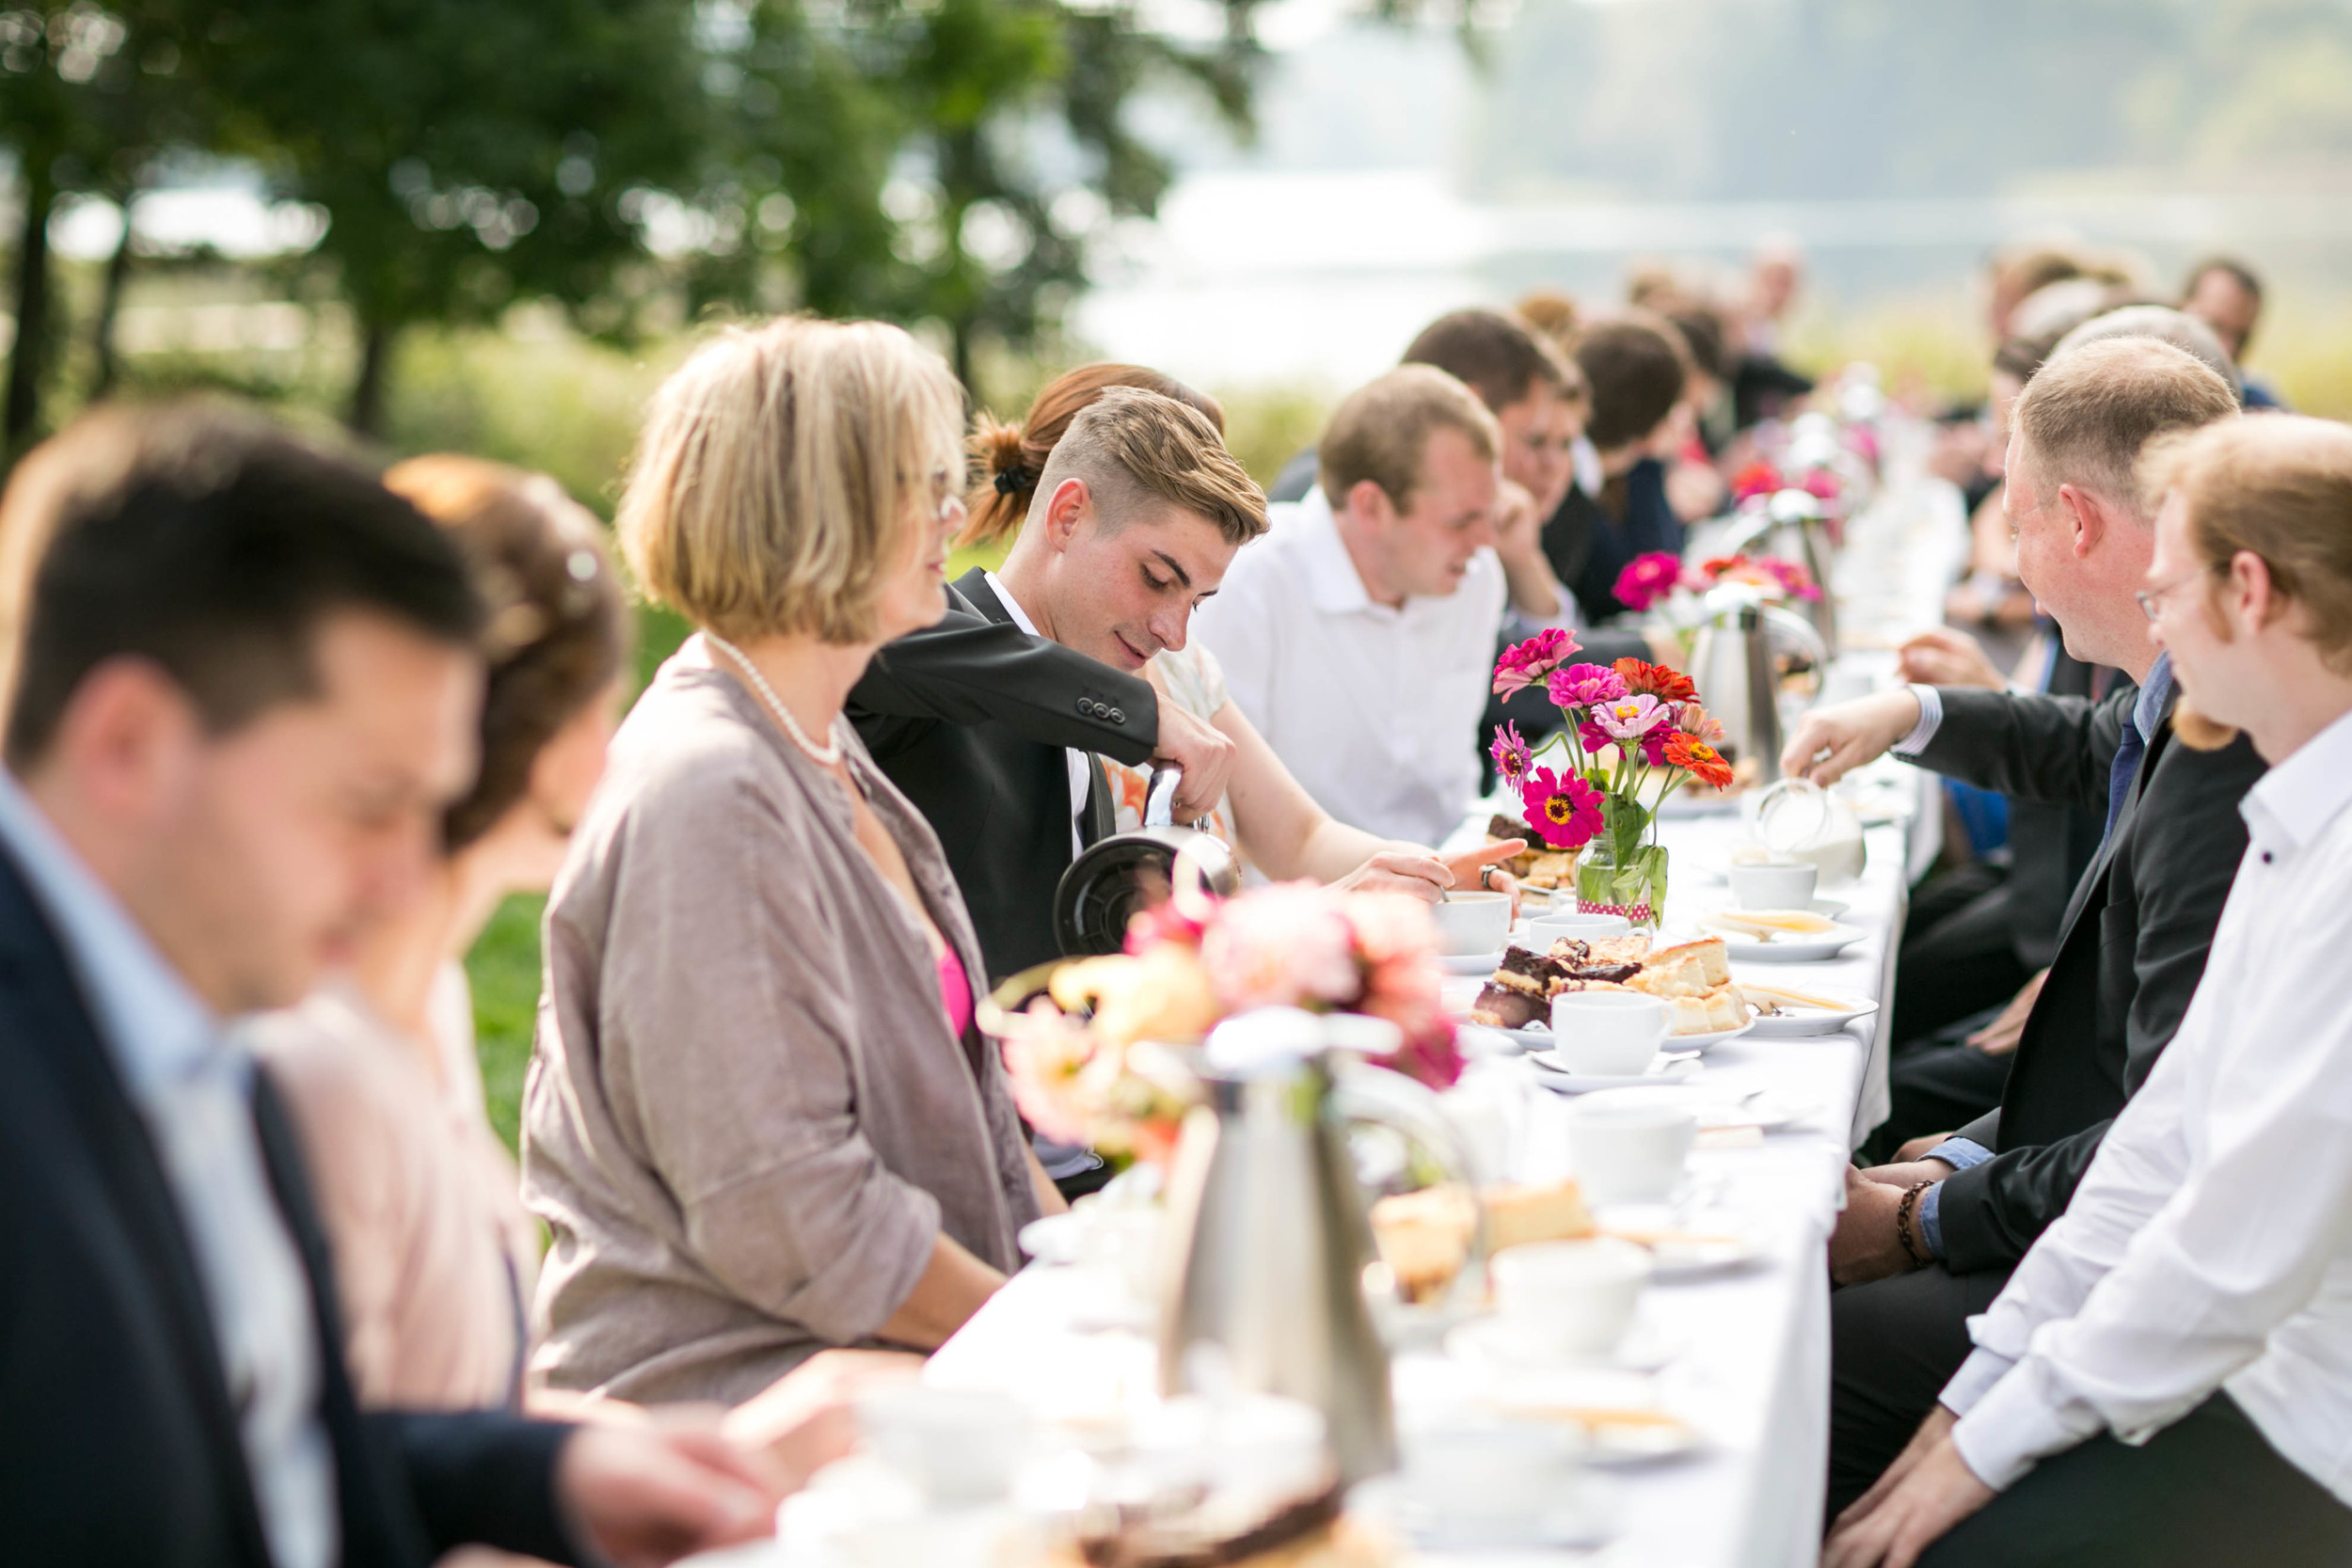 Fran Burrows Hochzeitsfotografie_Kulturgut Wrechen Hochzeit-41.jpg